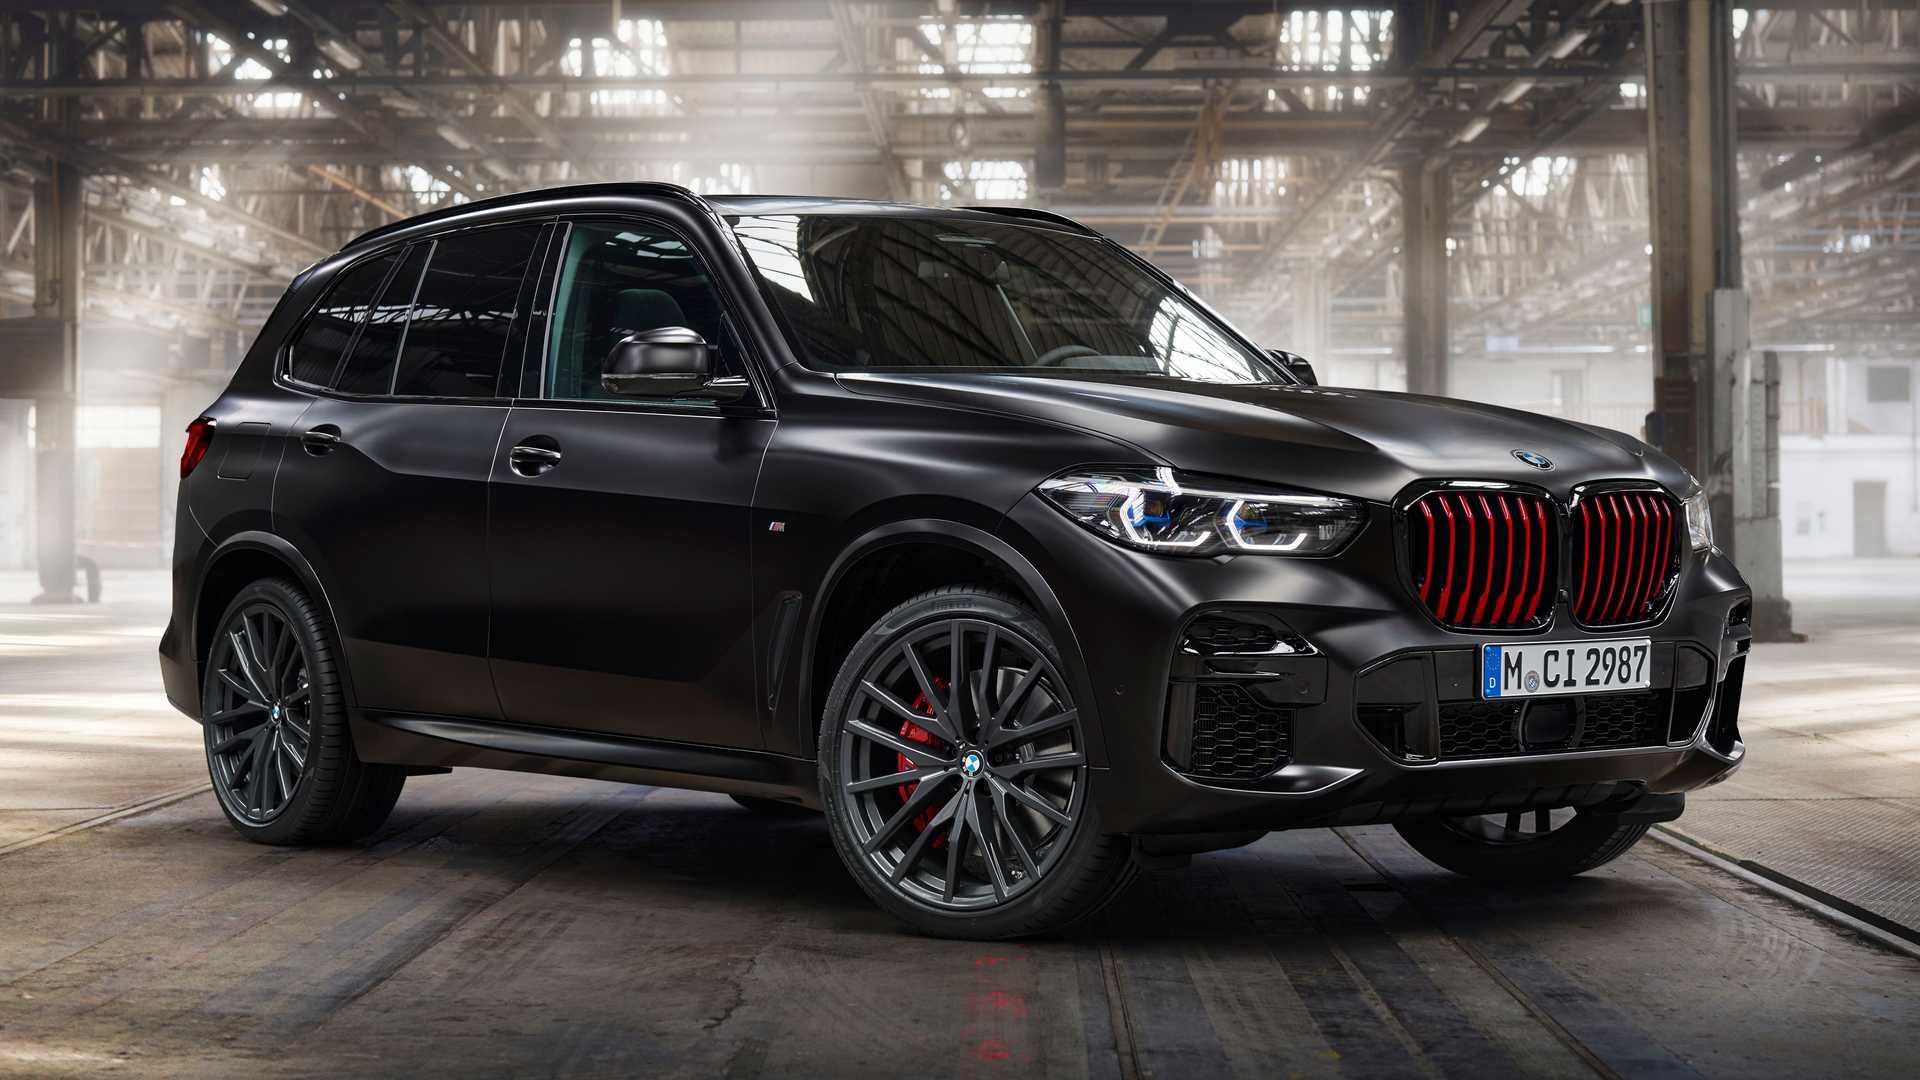 BMW X5 Black Vermillion Edition